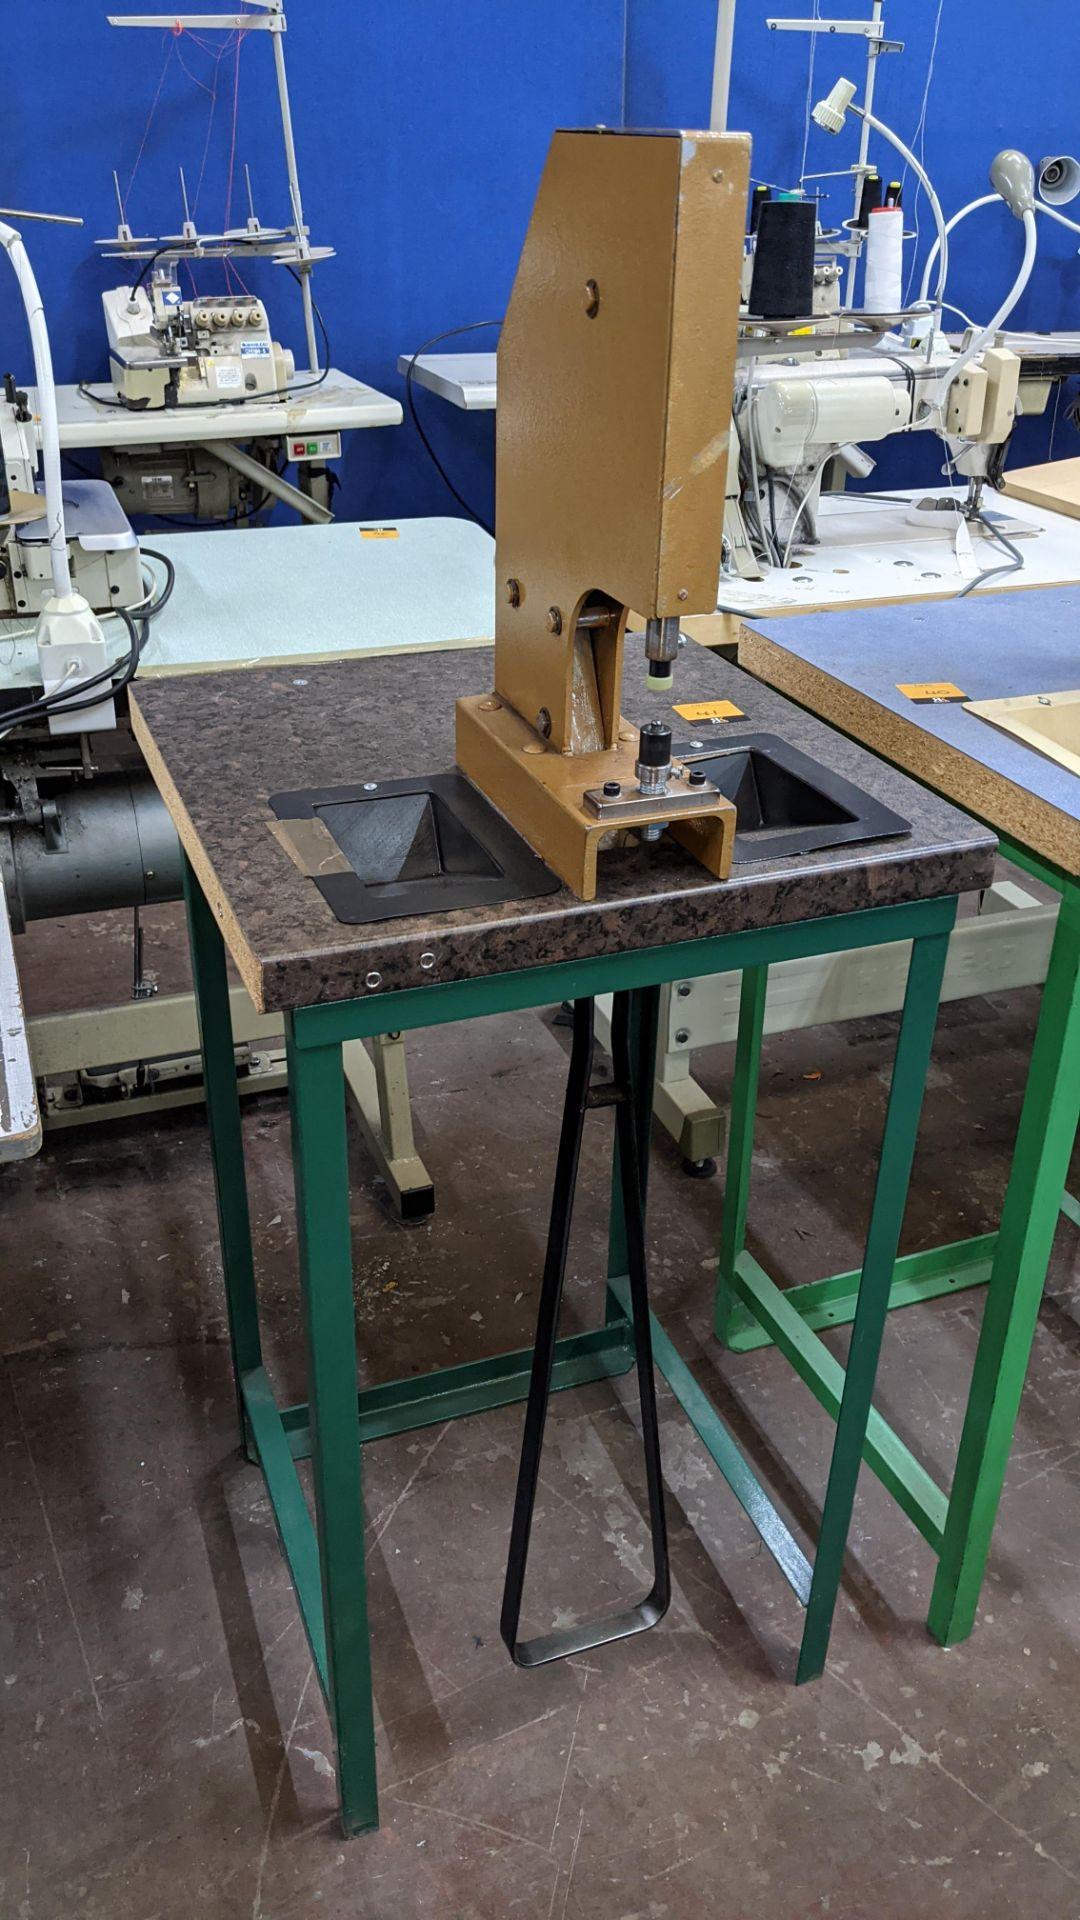 Foot operated riveting machine/press stud machine - Image 9 of 9